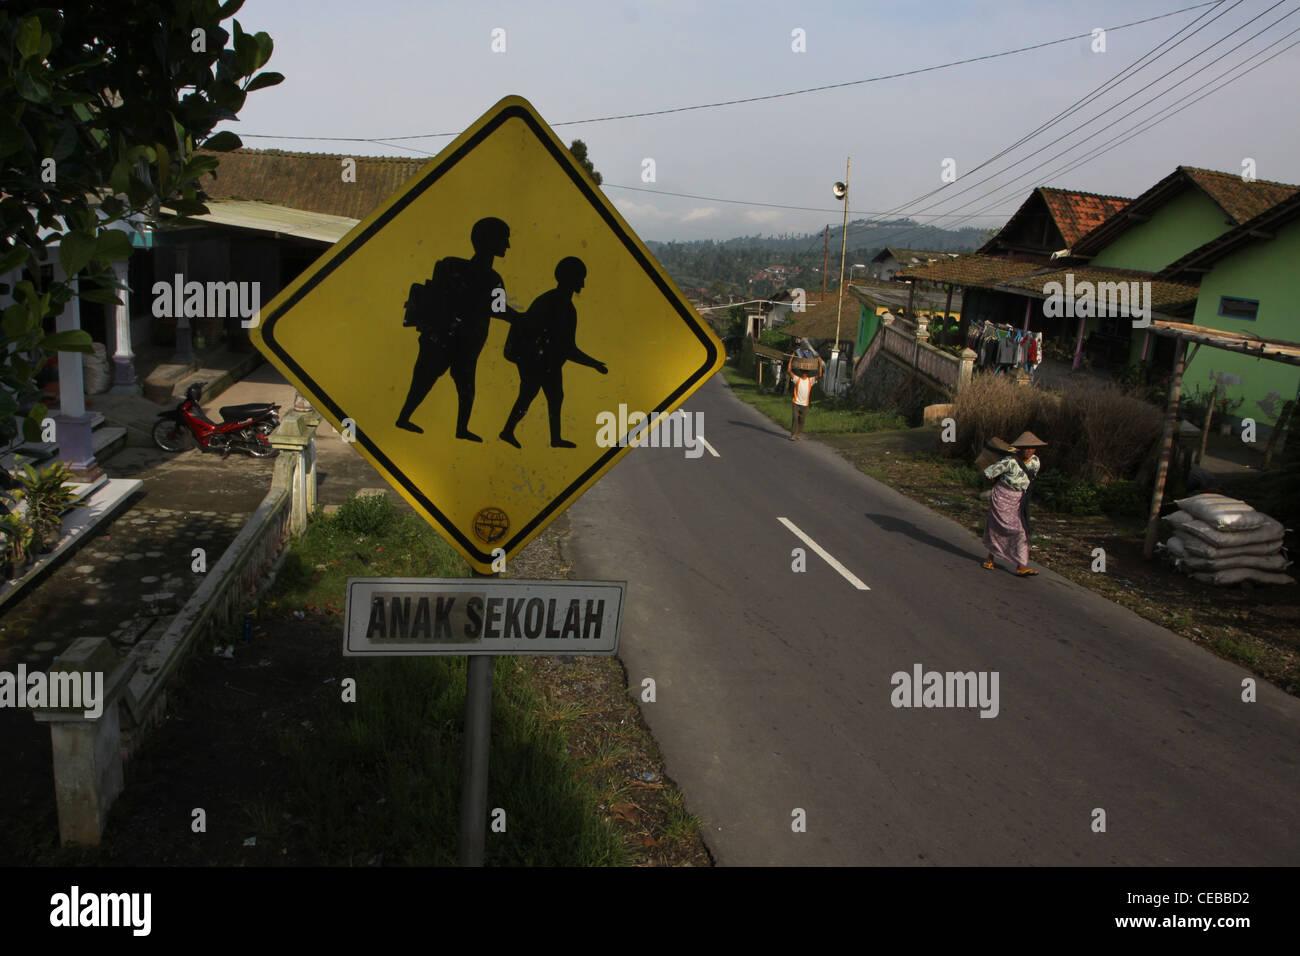 sign reading school children women carrying food village road Yogyakarta Indonesia - Stock Image